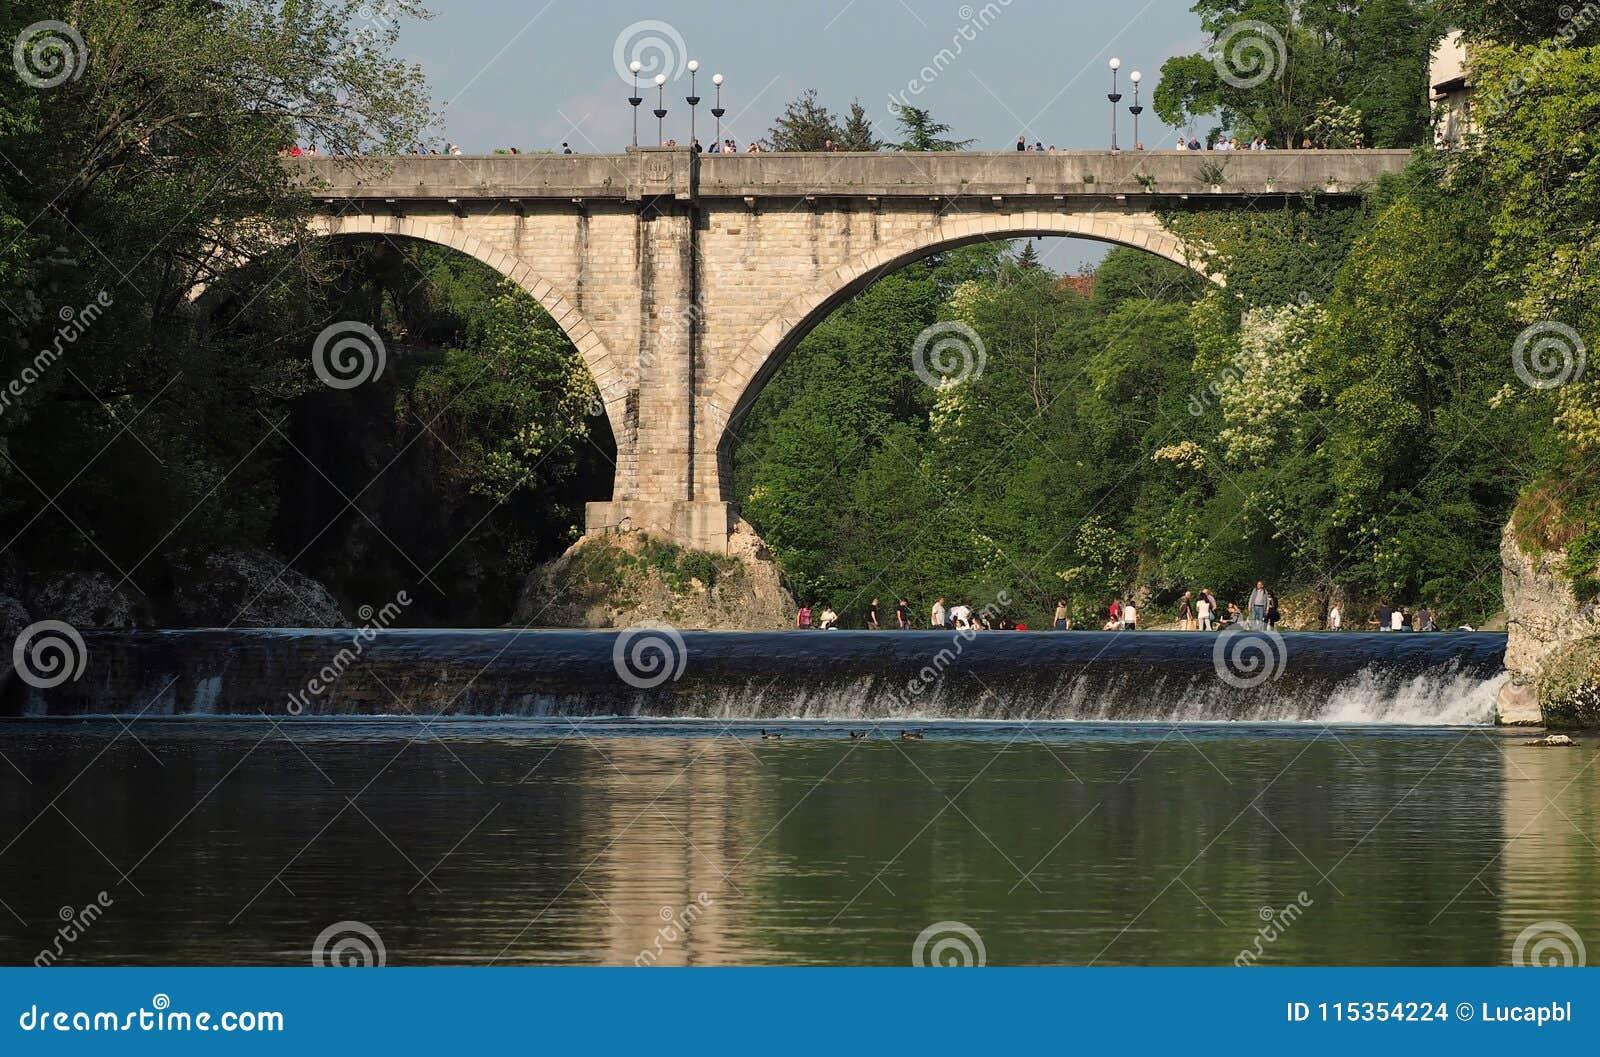 Cividale del Friuli/Italy - April 25 2018: Devil`s bridge on Natison river with some people enjoy the sun under it